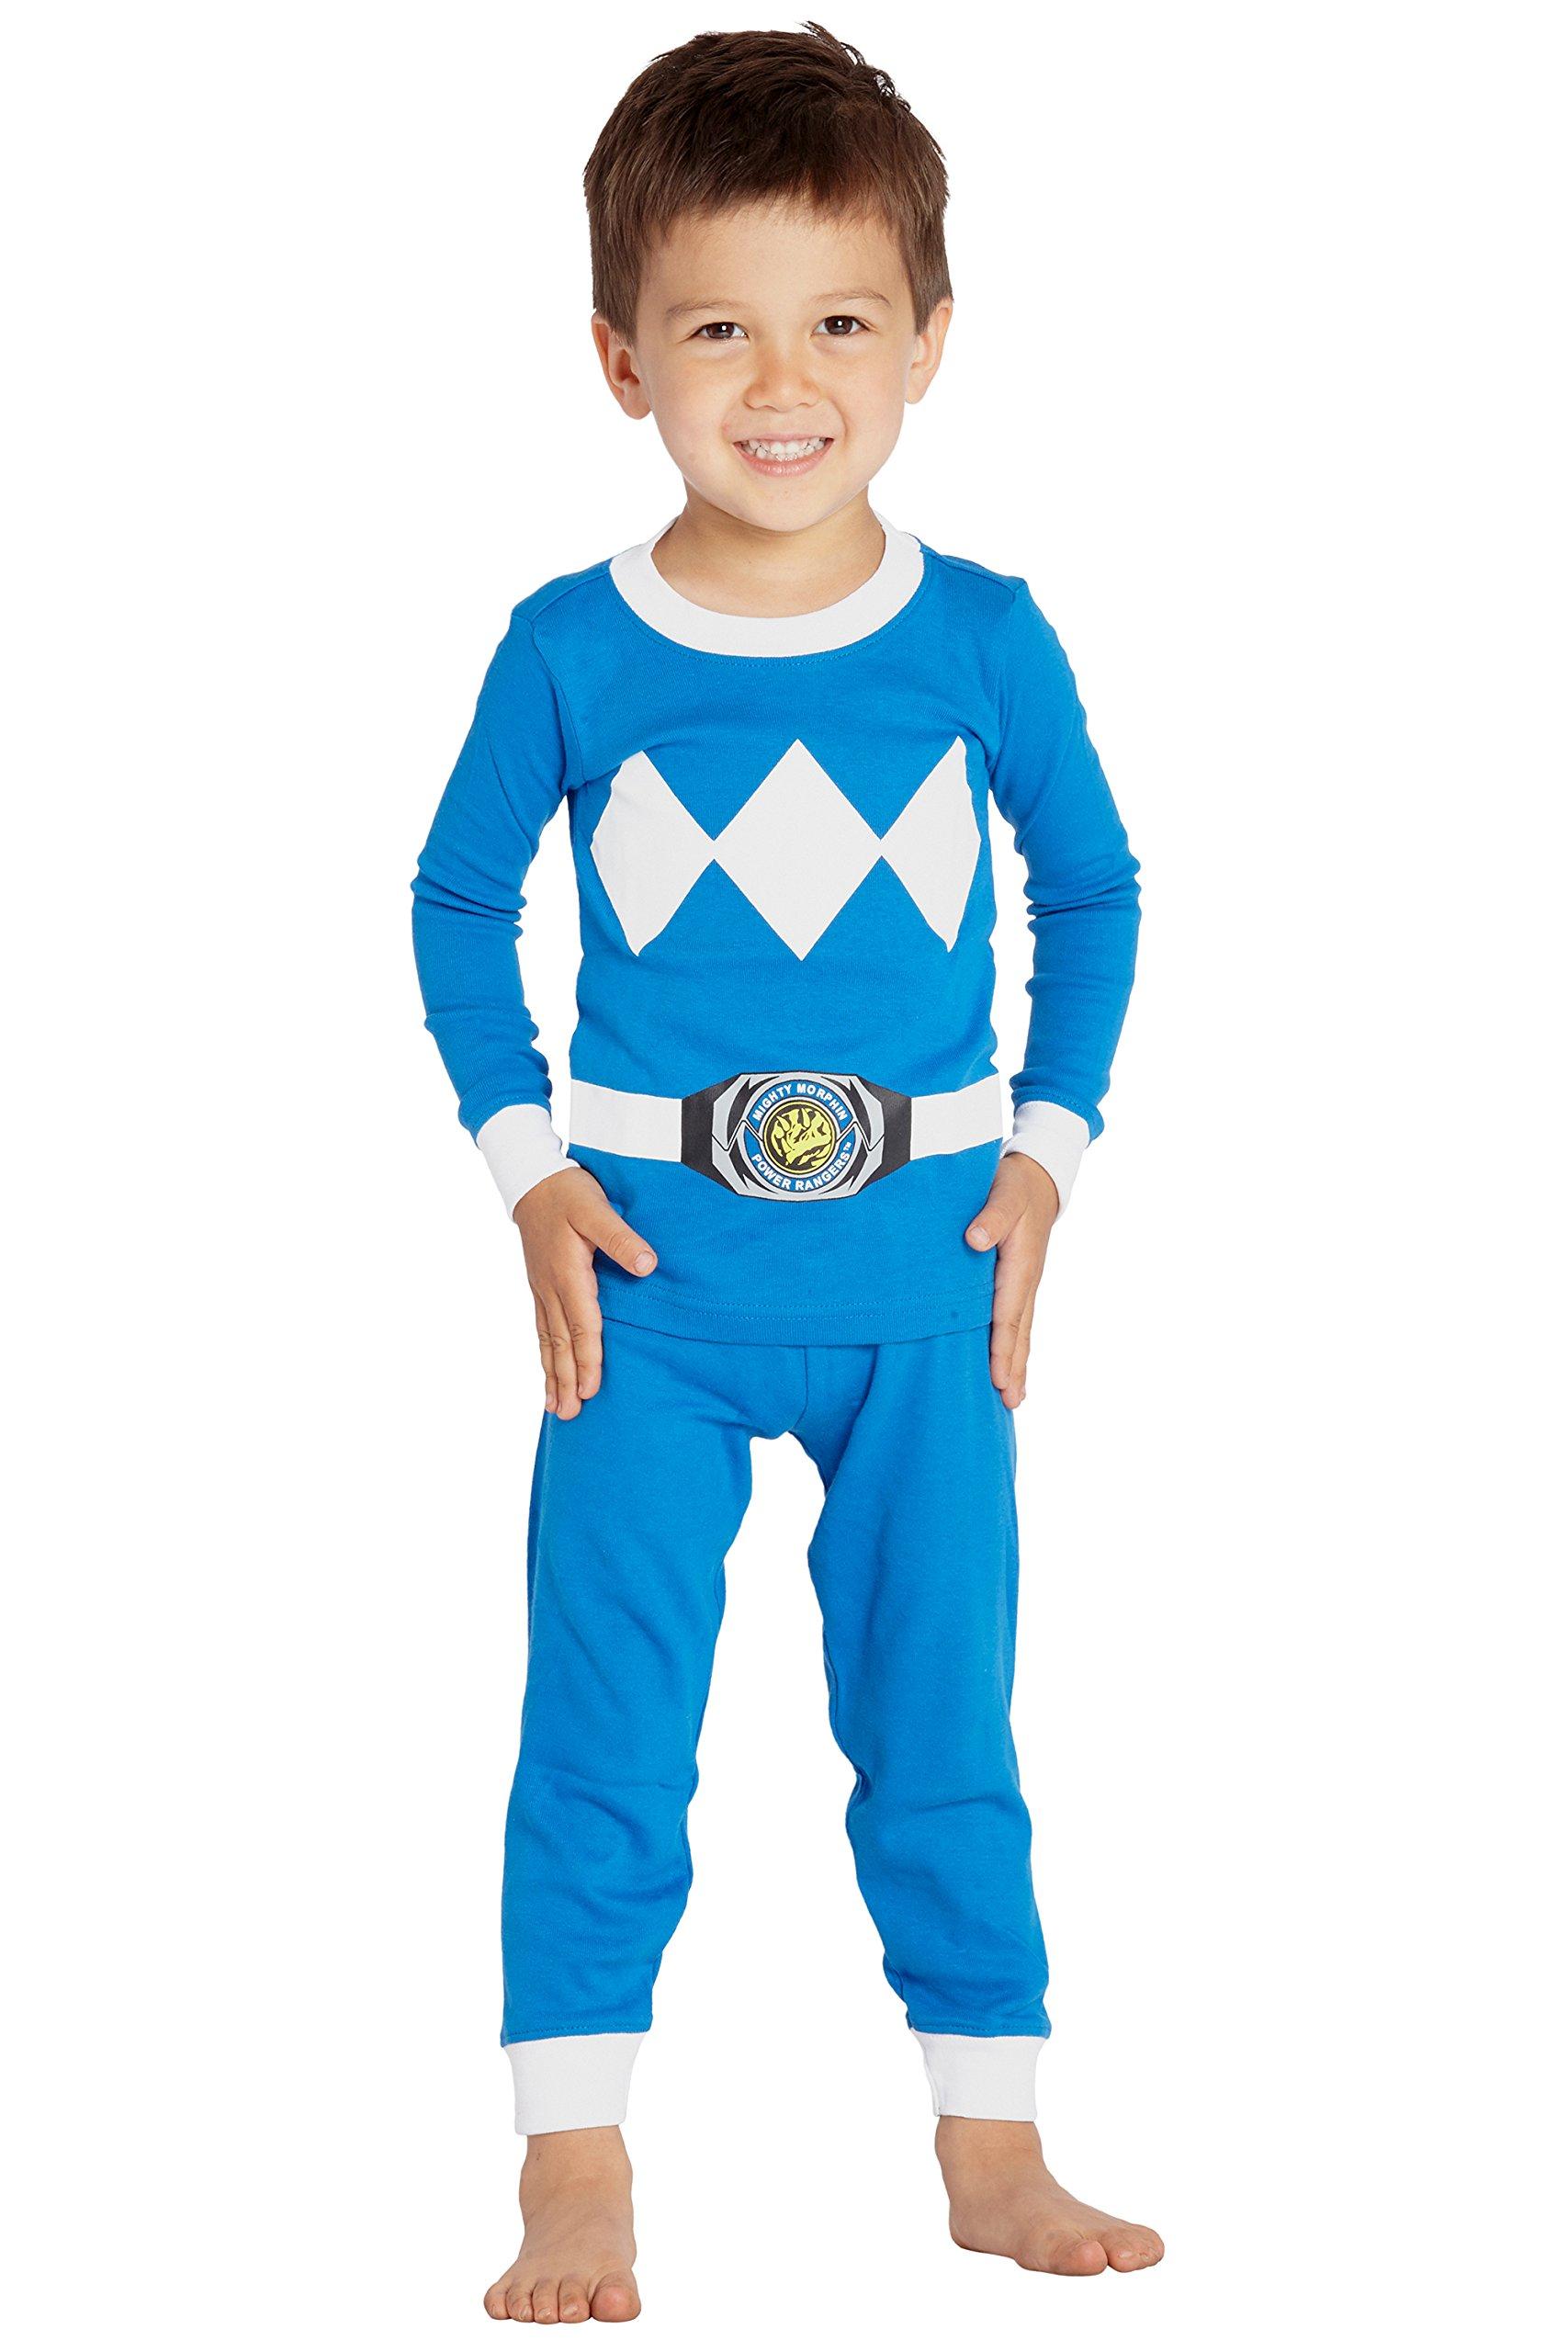 Mighty Morphin Power Rangers Costume Pajamas Boys Girls Saban Sleepwear